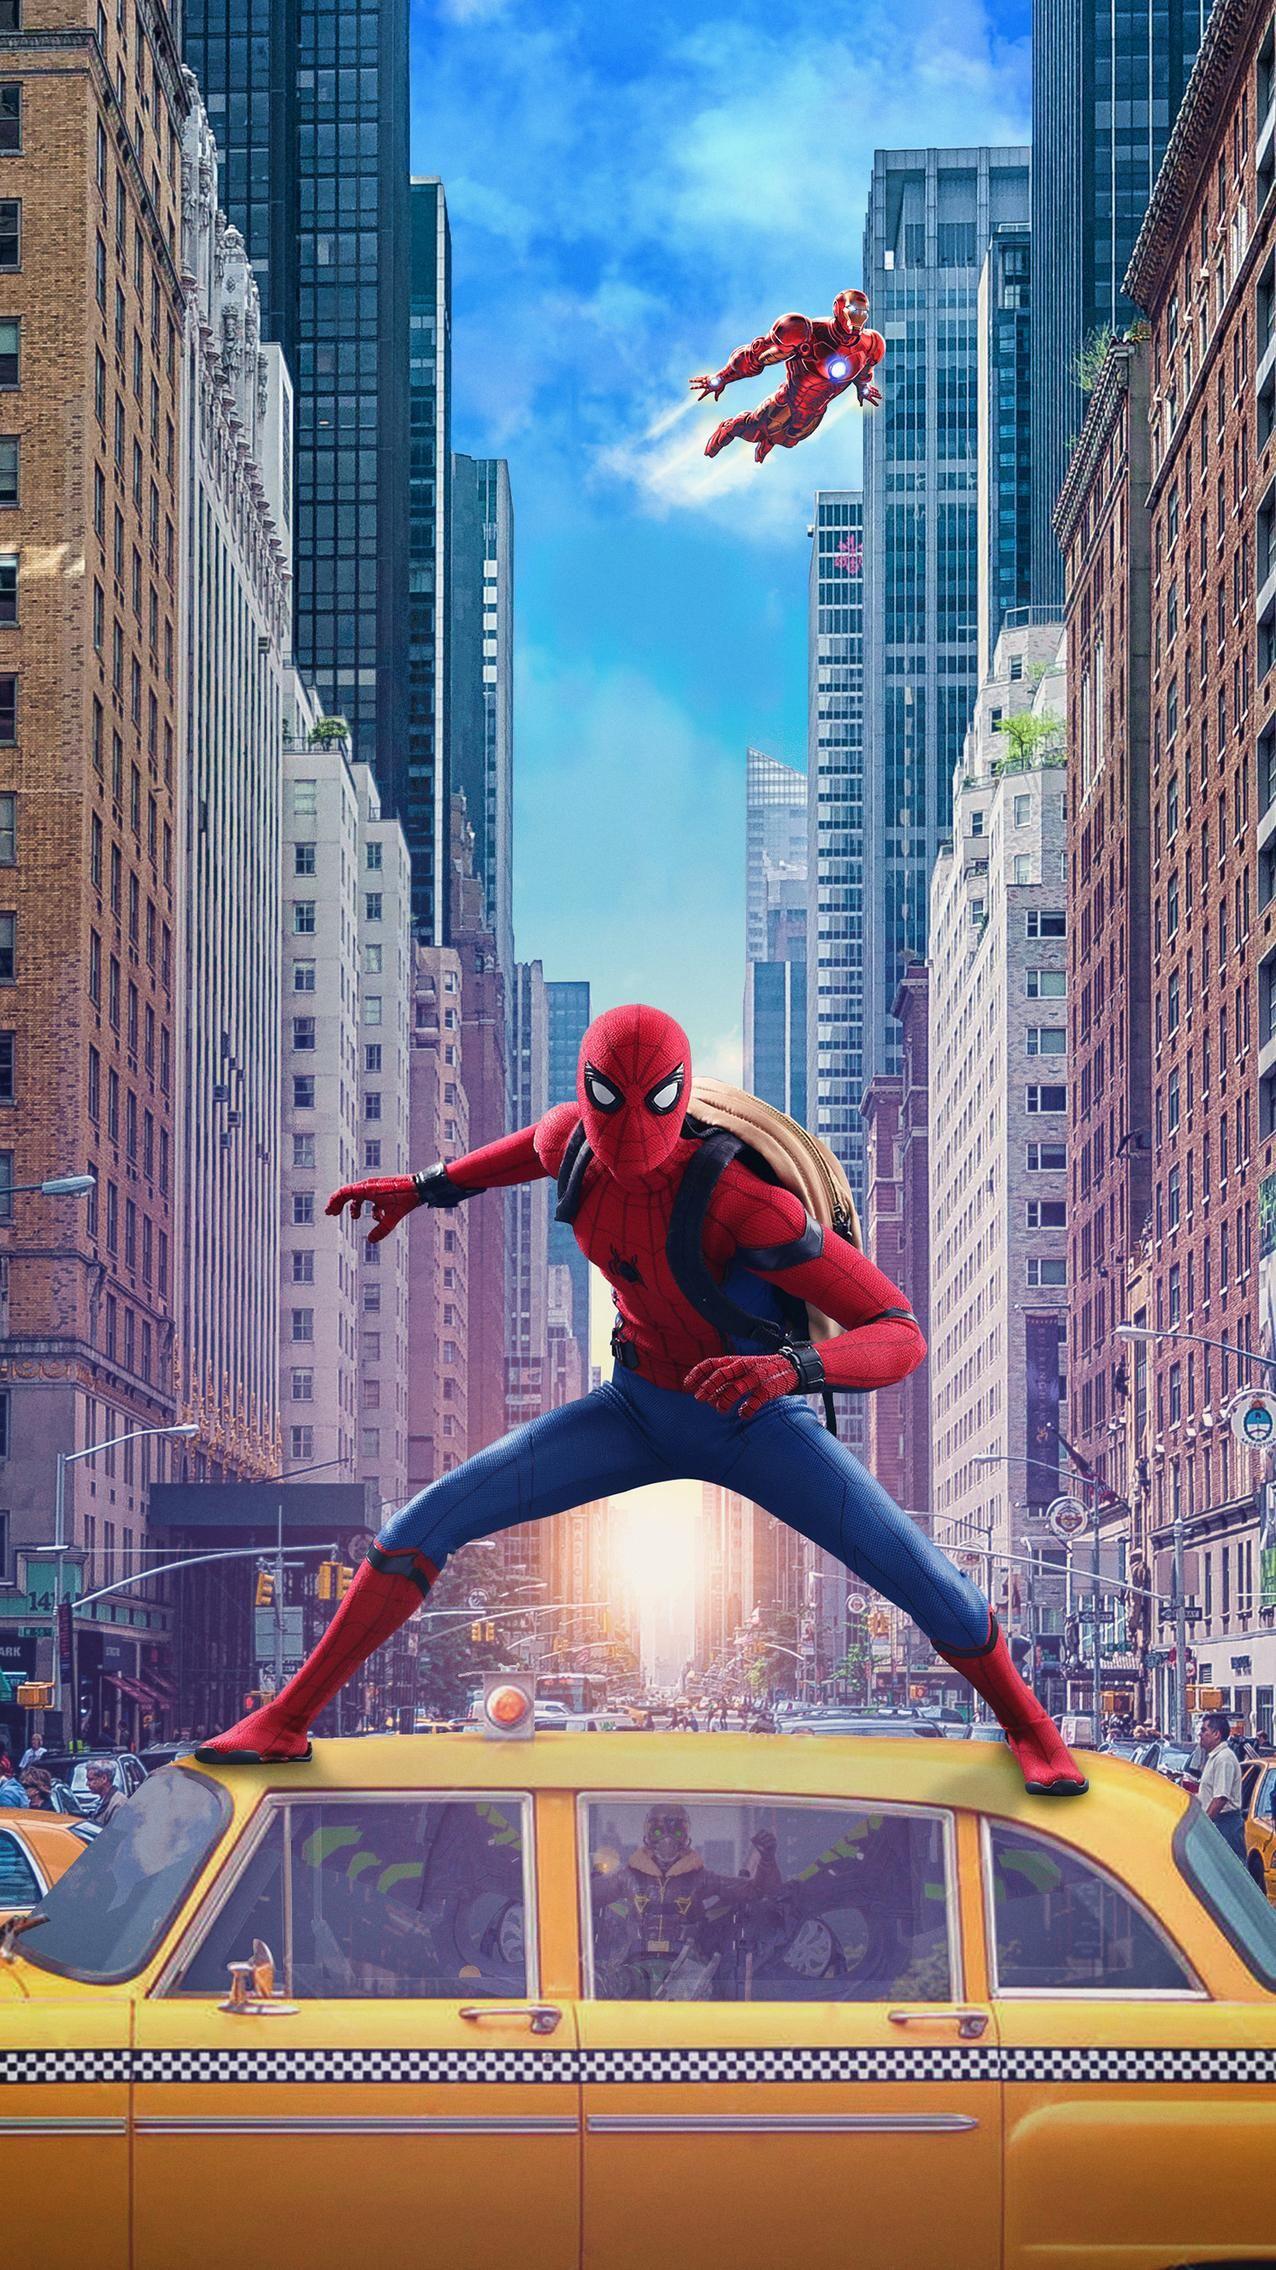 Spider Man Homecoming 2017 Phone Wallpaper Marvel Movie